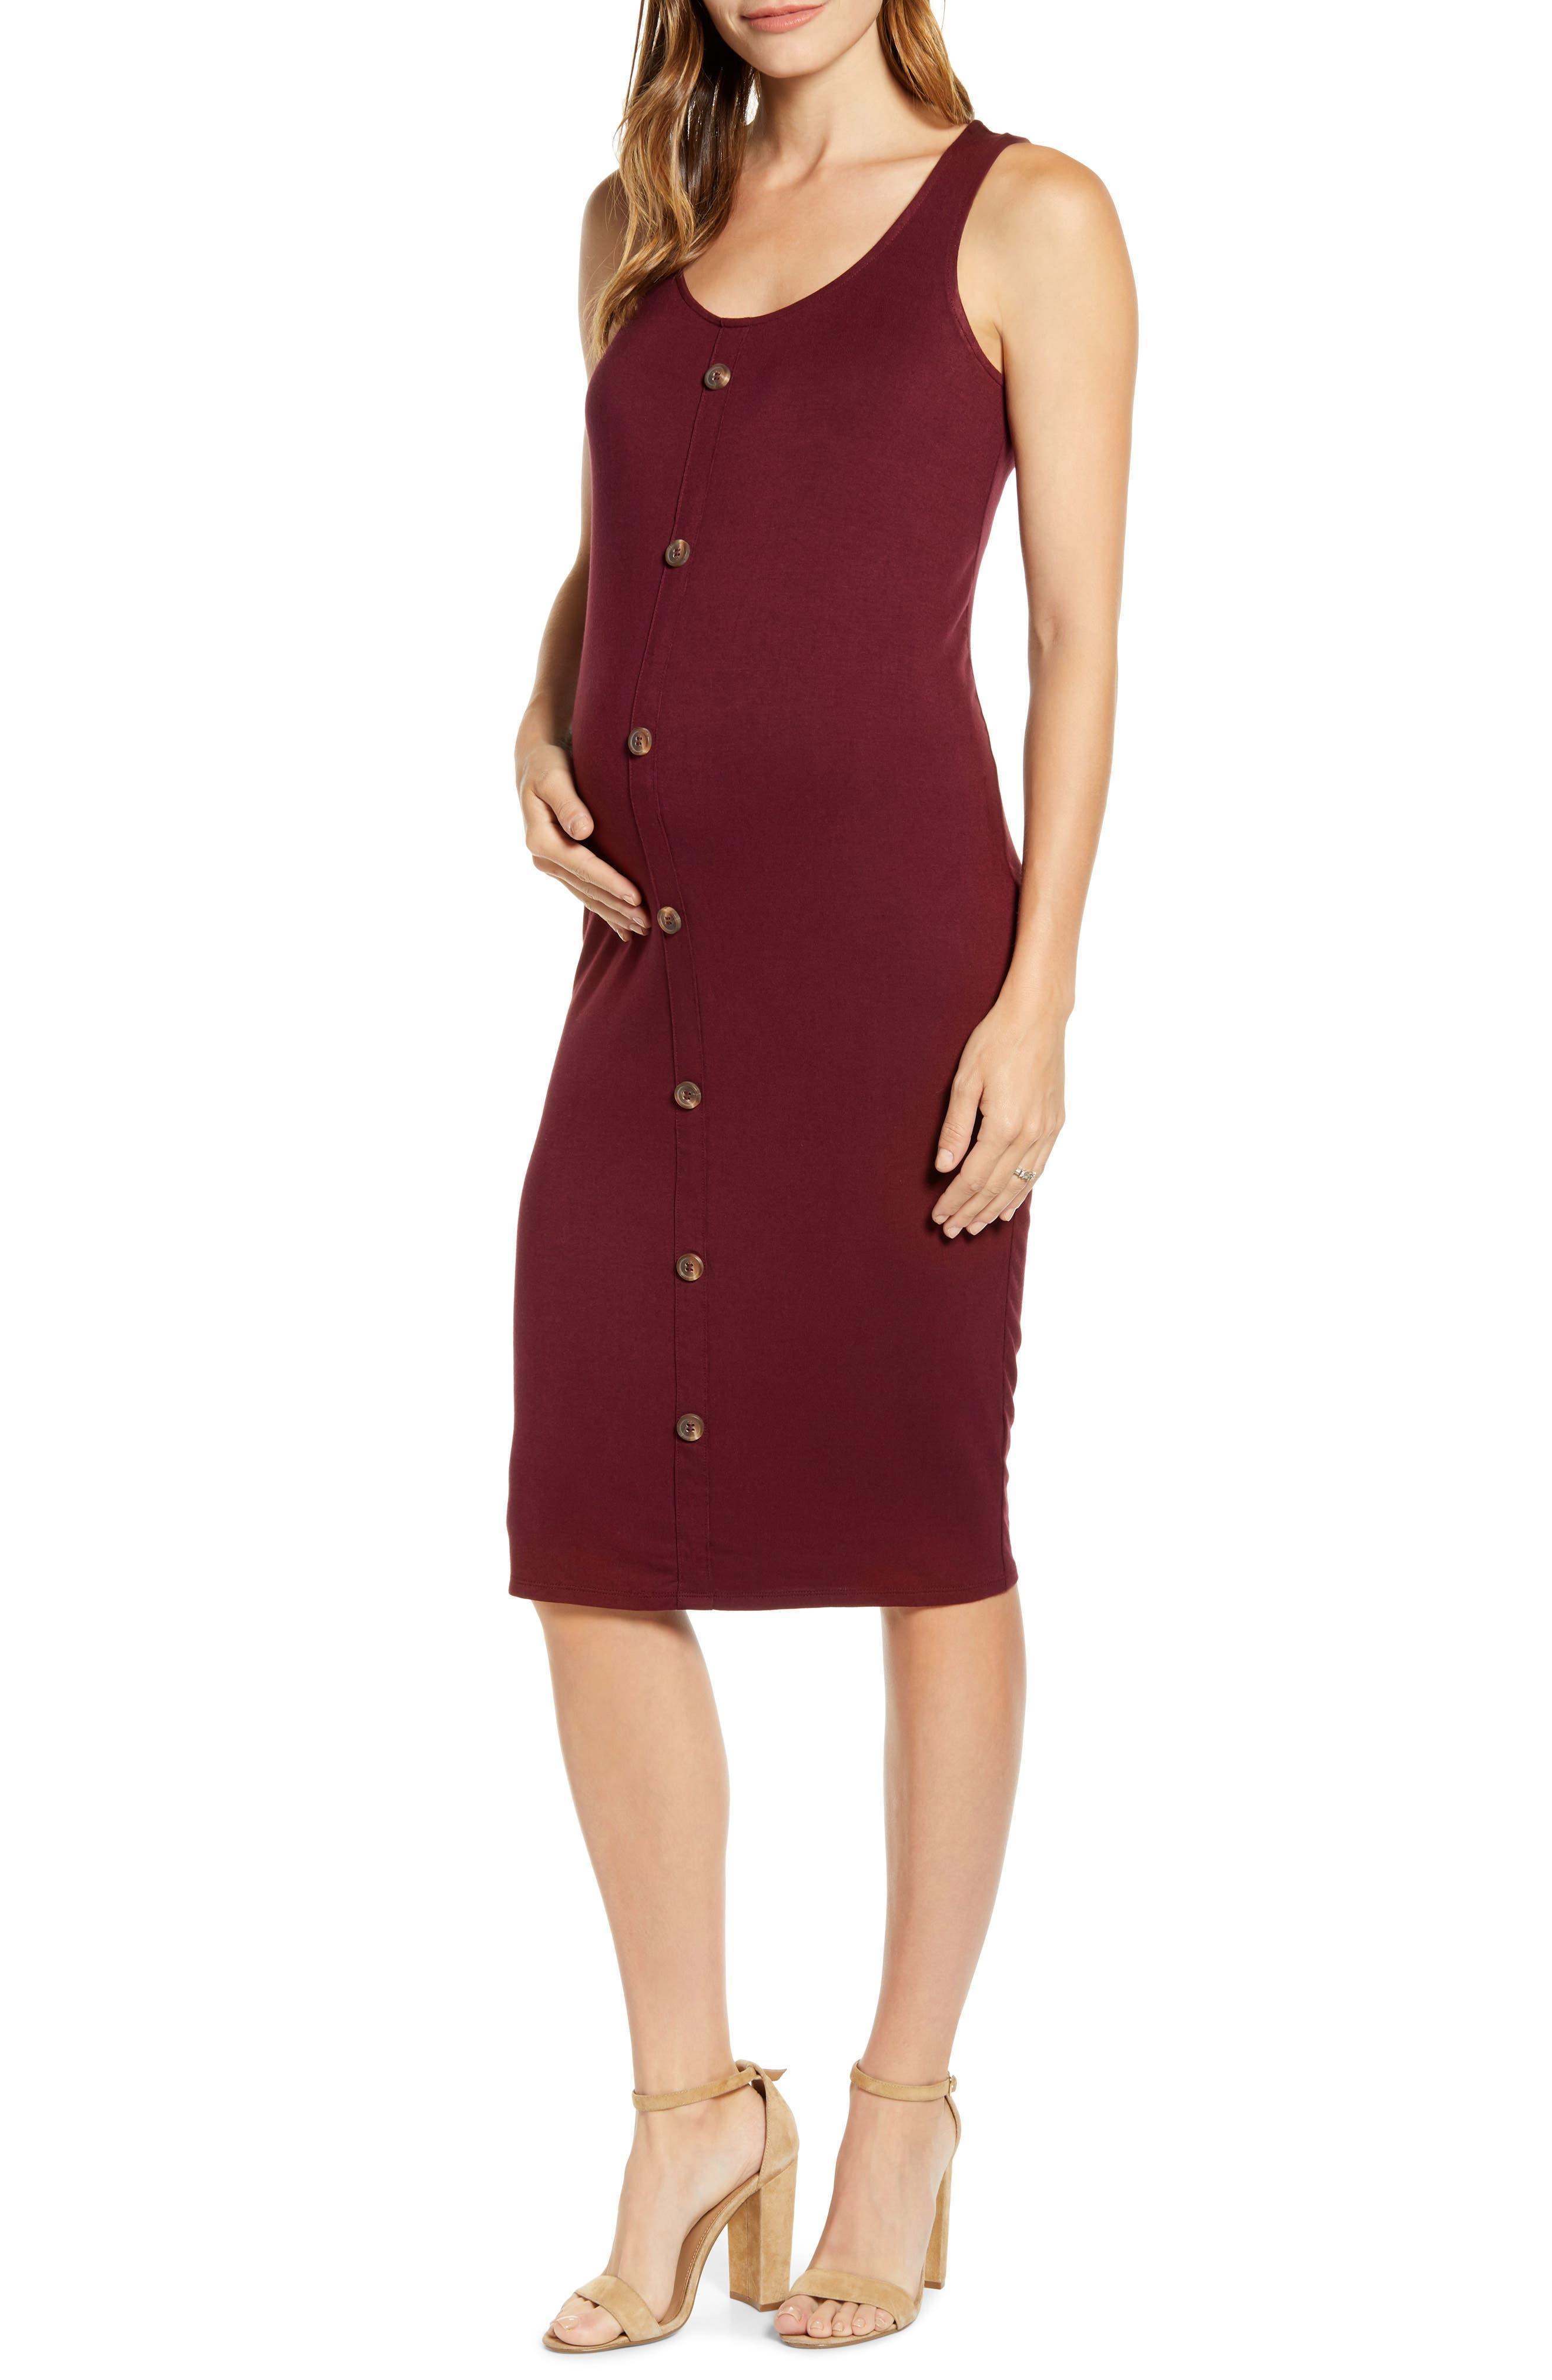 Fourteenth Place Maternity Tank Dress, Burgundy